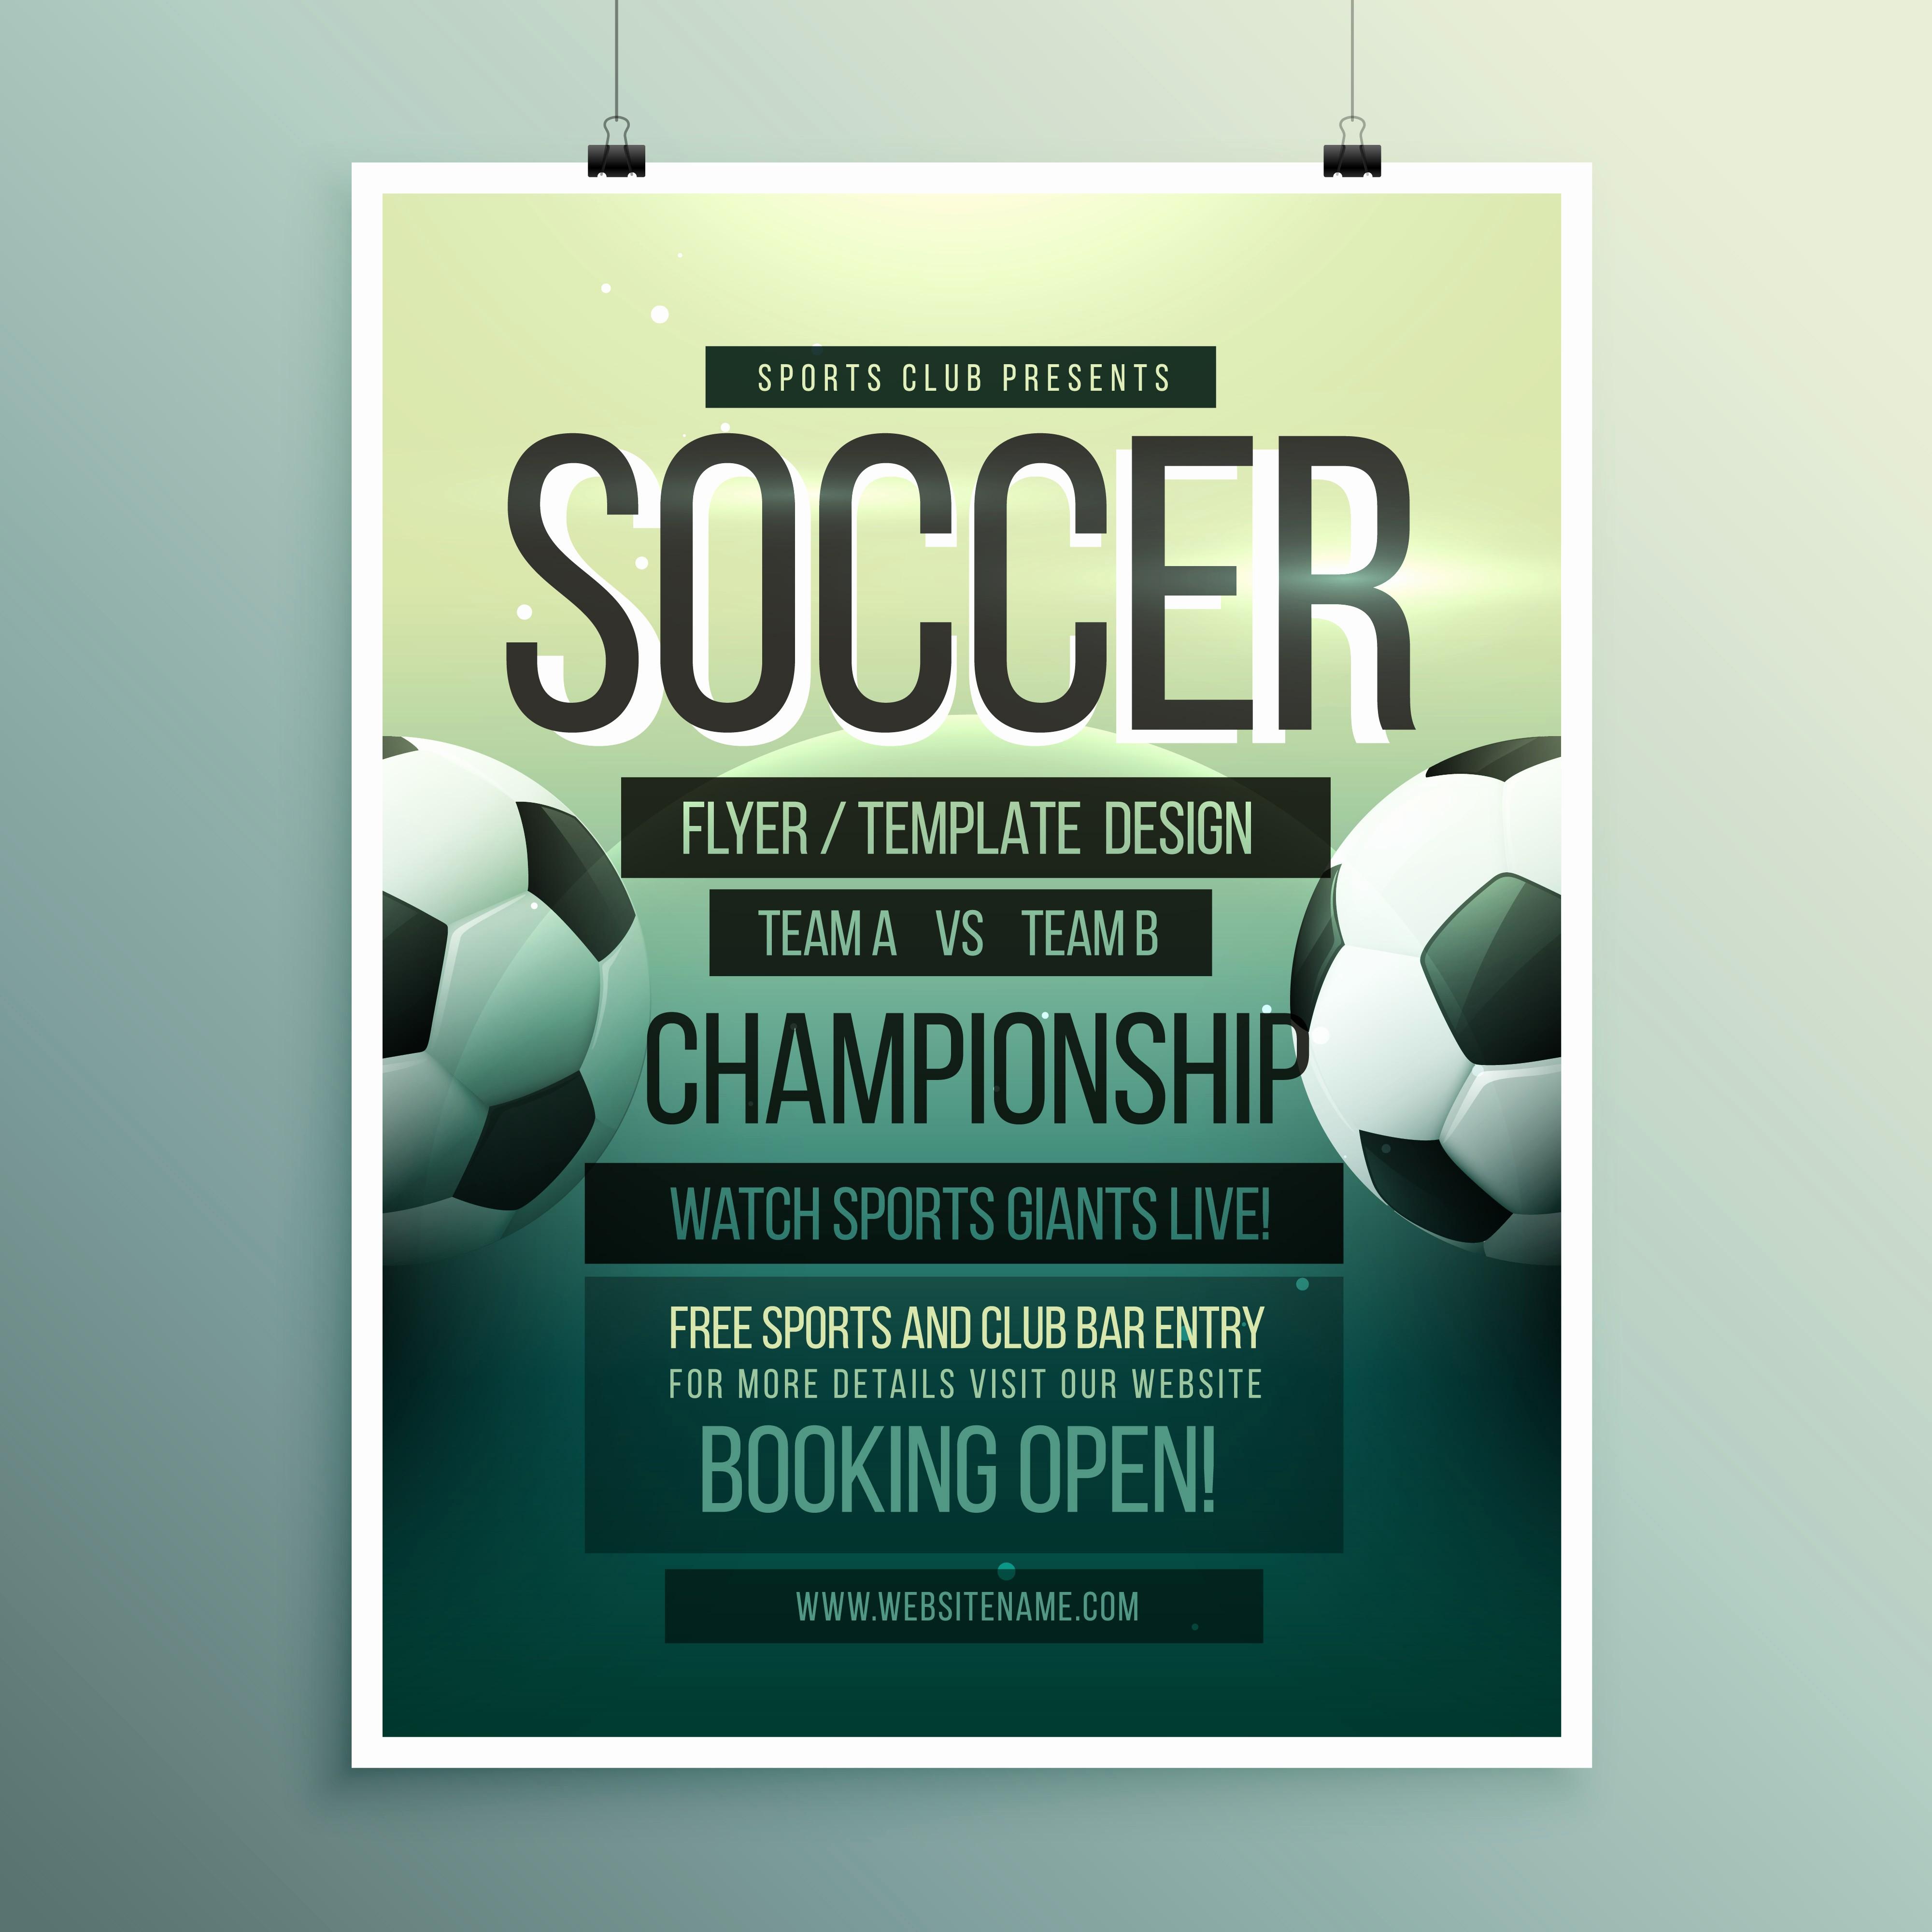 Softball tournament Flyer Template Free Lovely soccer tournament Championship Game Flyer Brochure